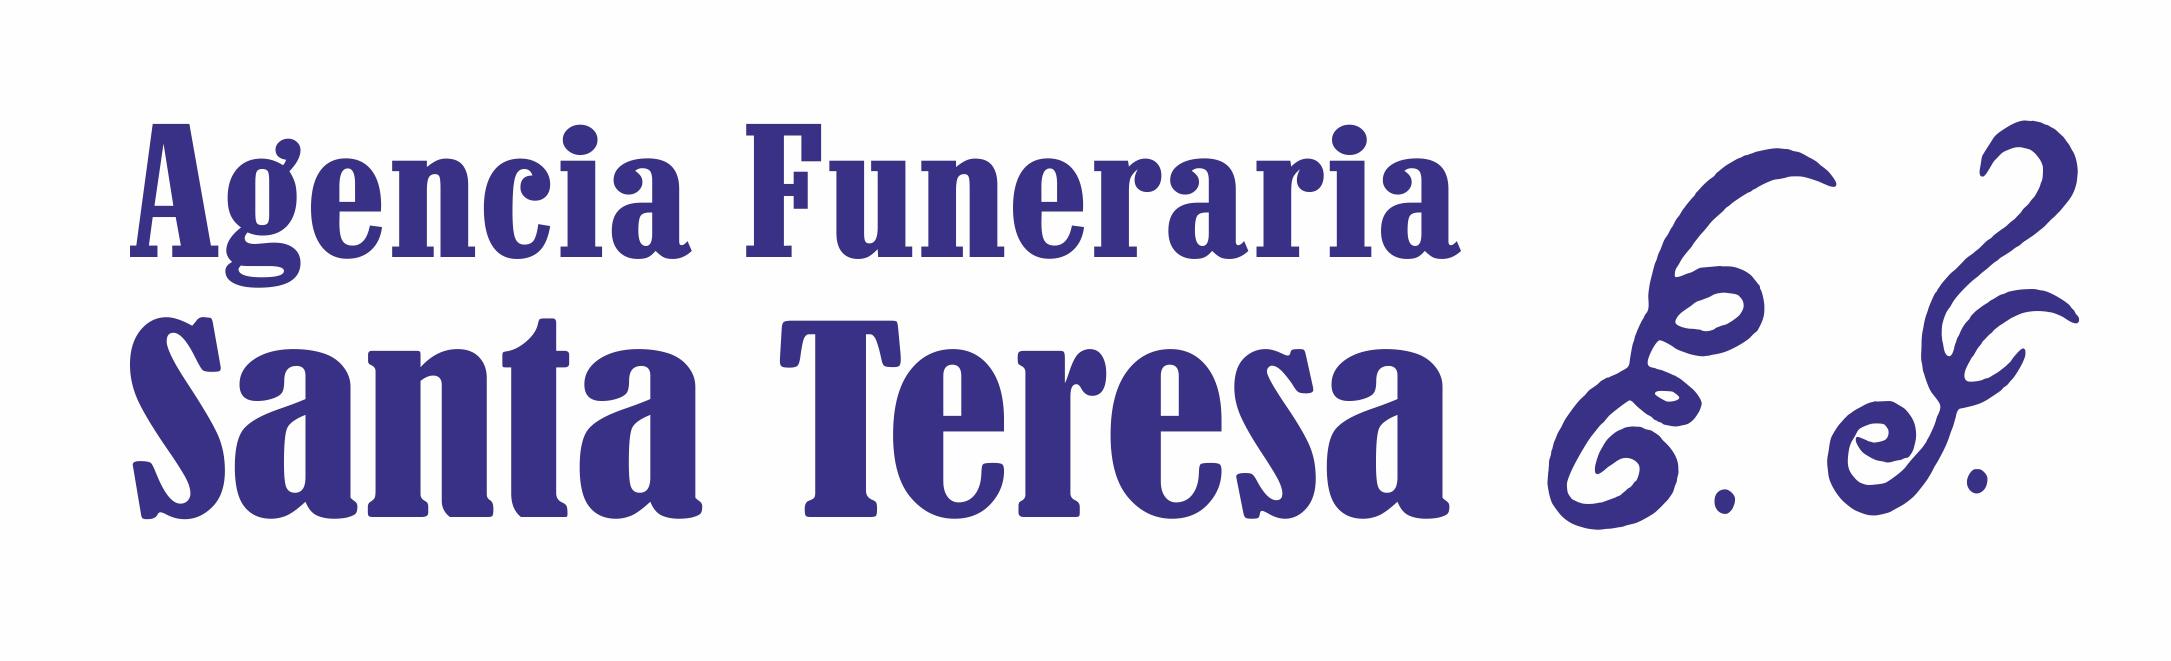 Agencia Funeraria Santa Teresa